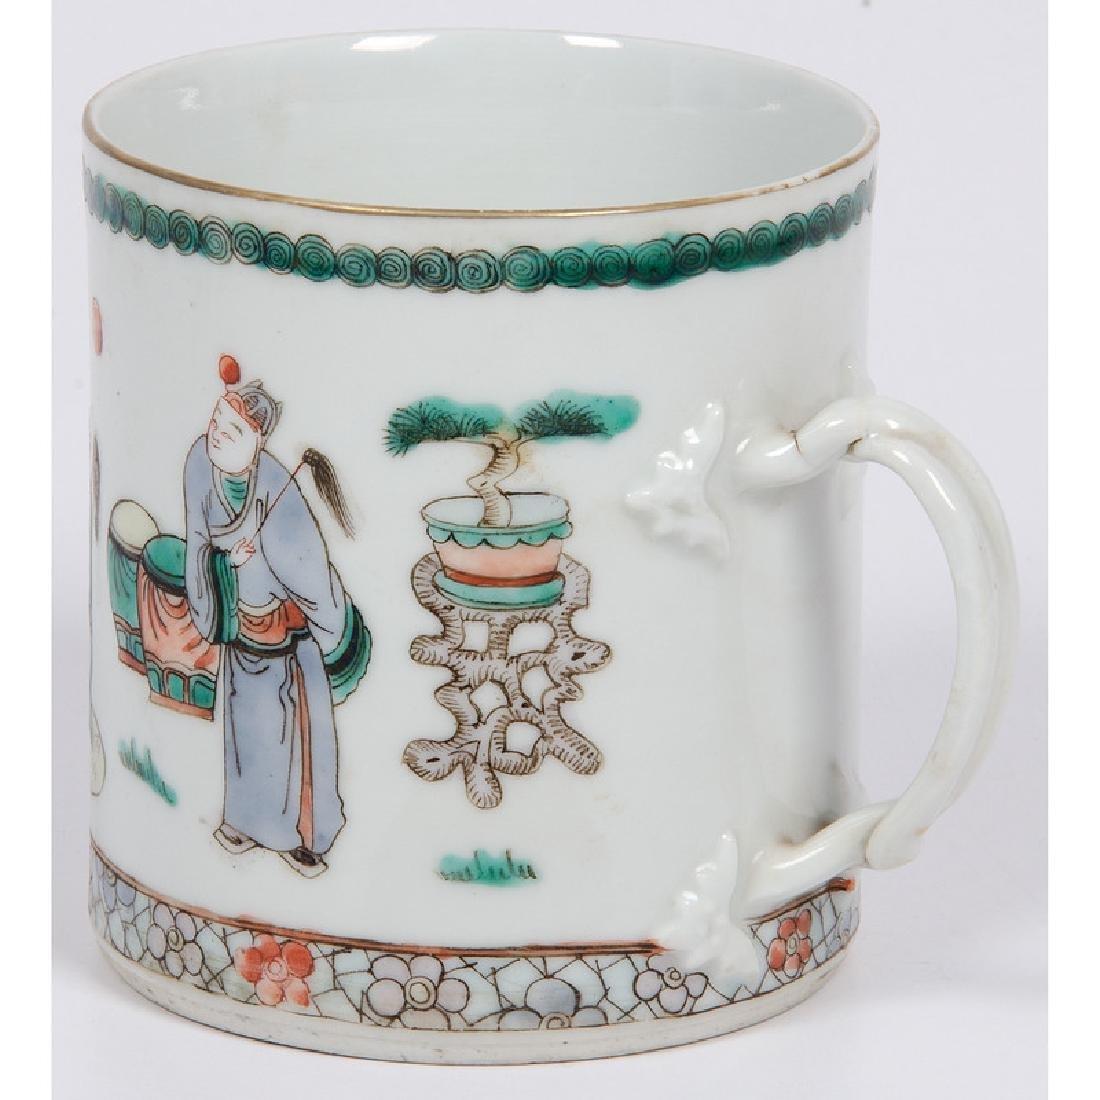 Chinese Export Mug and Plate - 3